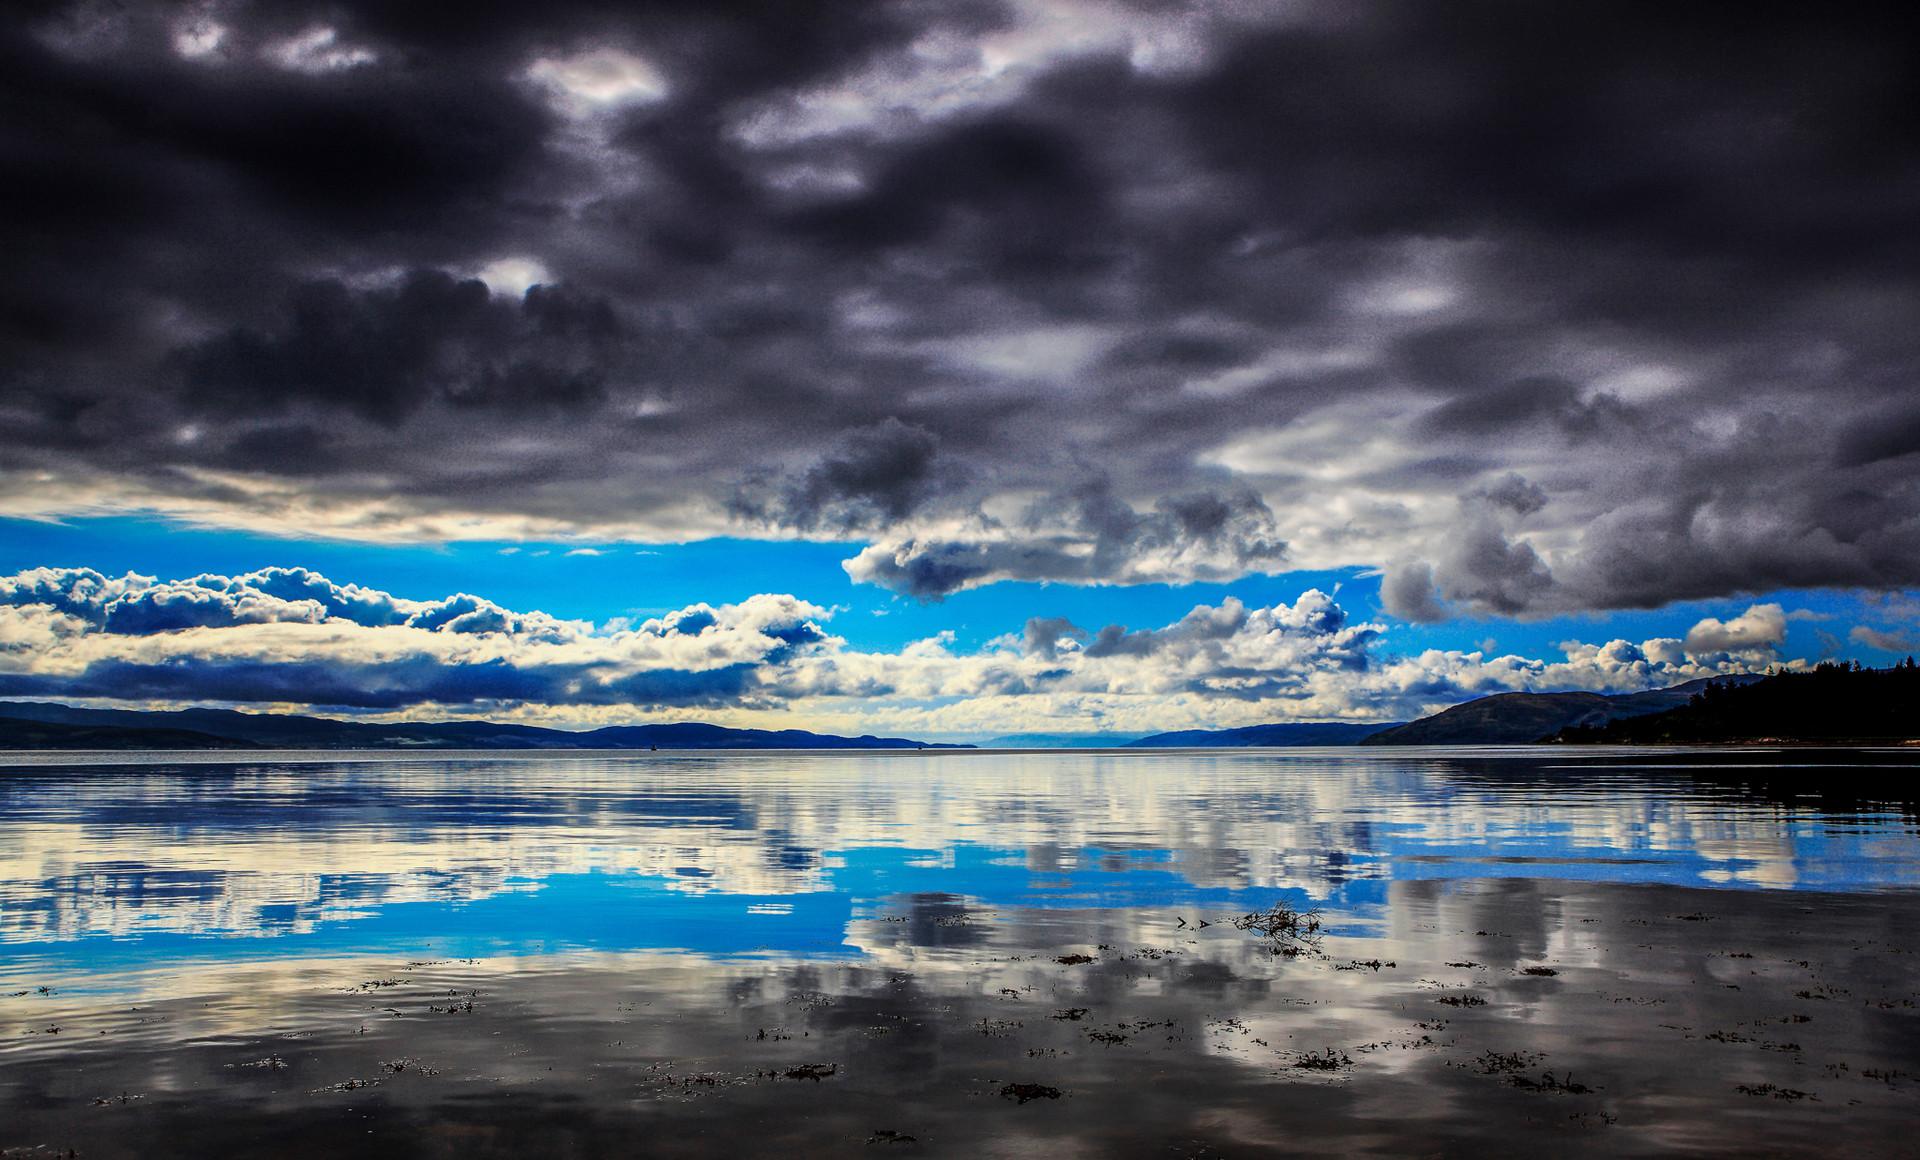 Loch Lomond, Scotland, 2010